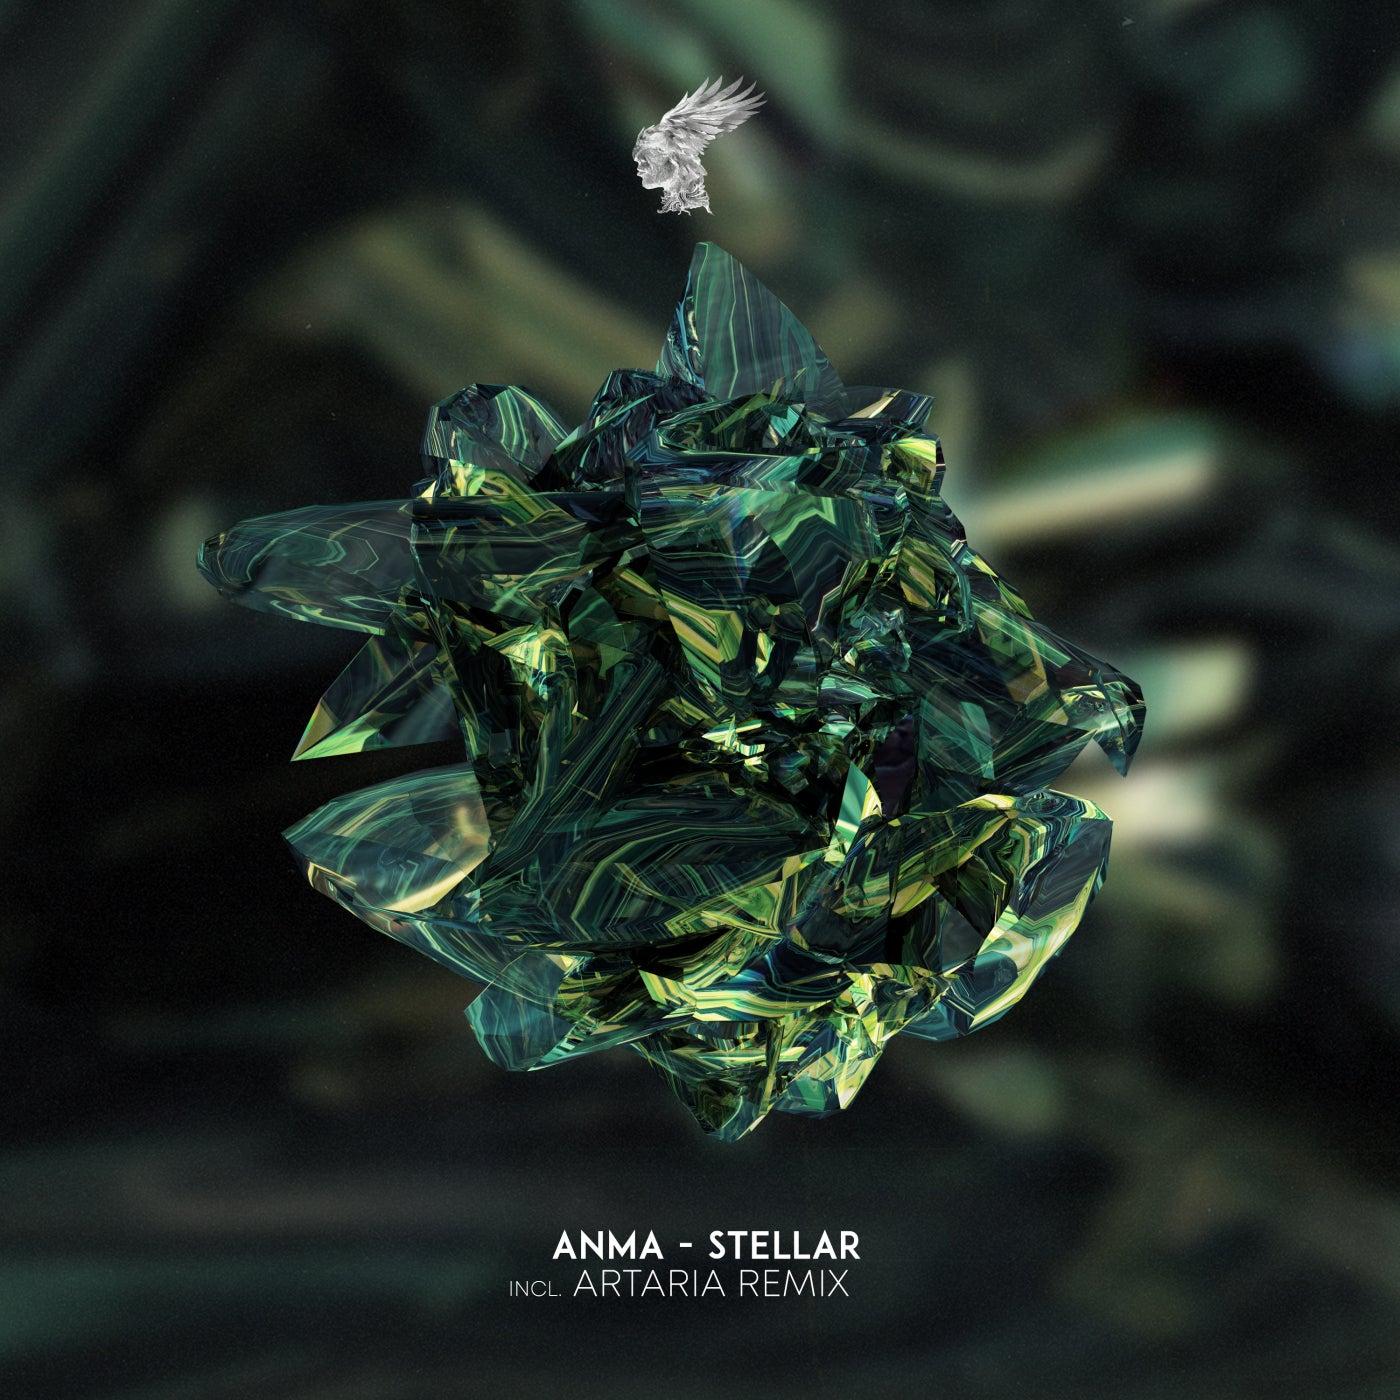 Stellar (Artaria Remix)